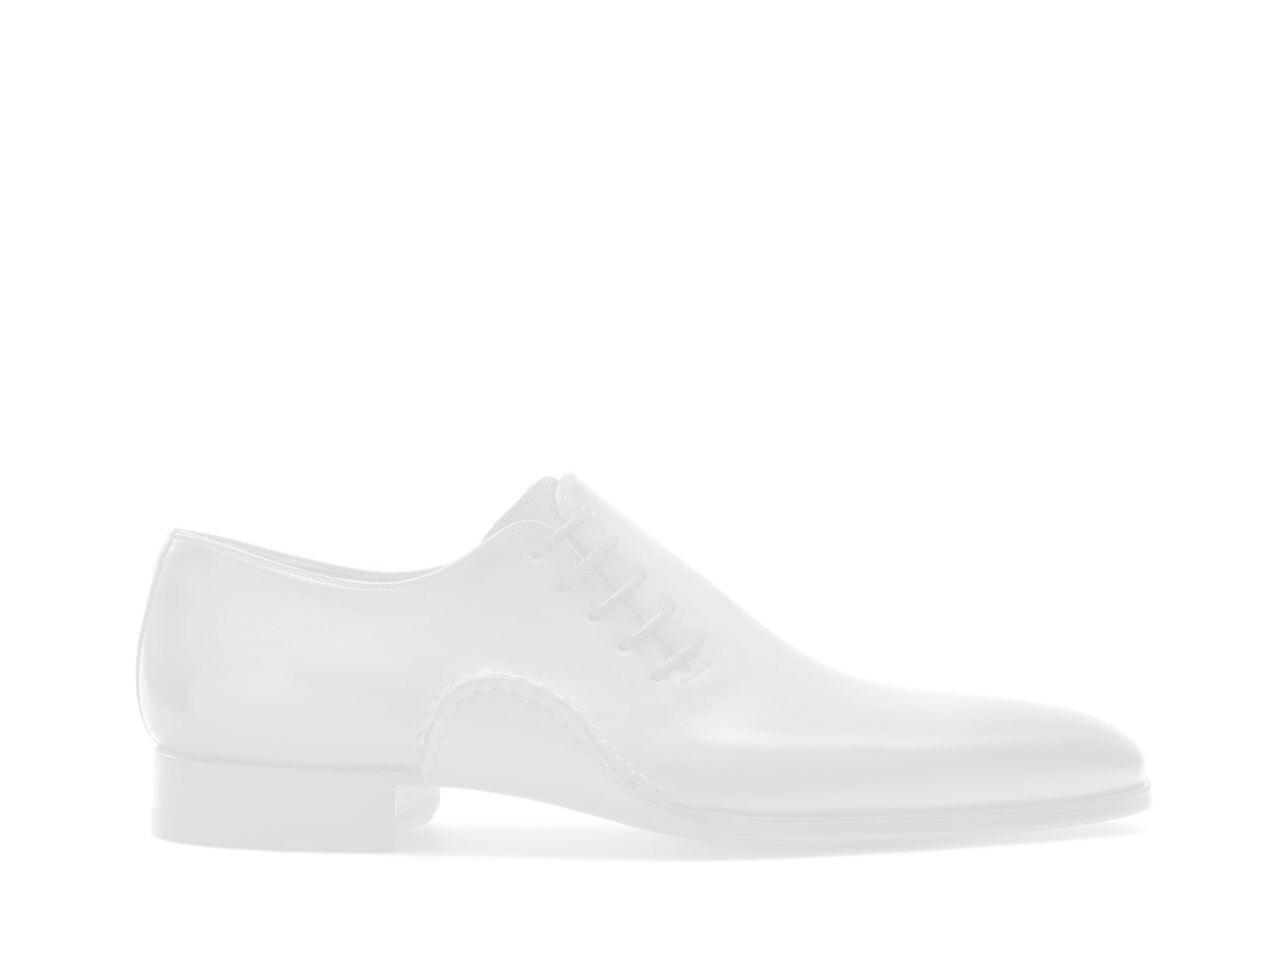 Sole of the Magnanni Altamira Brown Men's Double Monk Strap Shoes